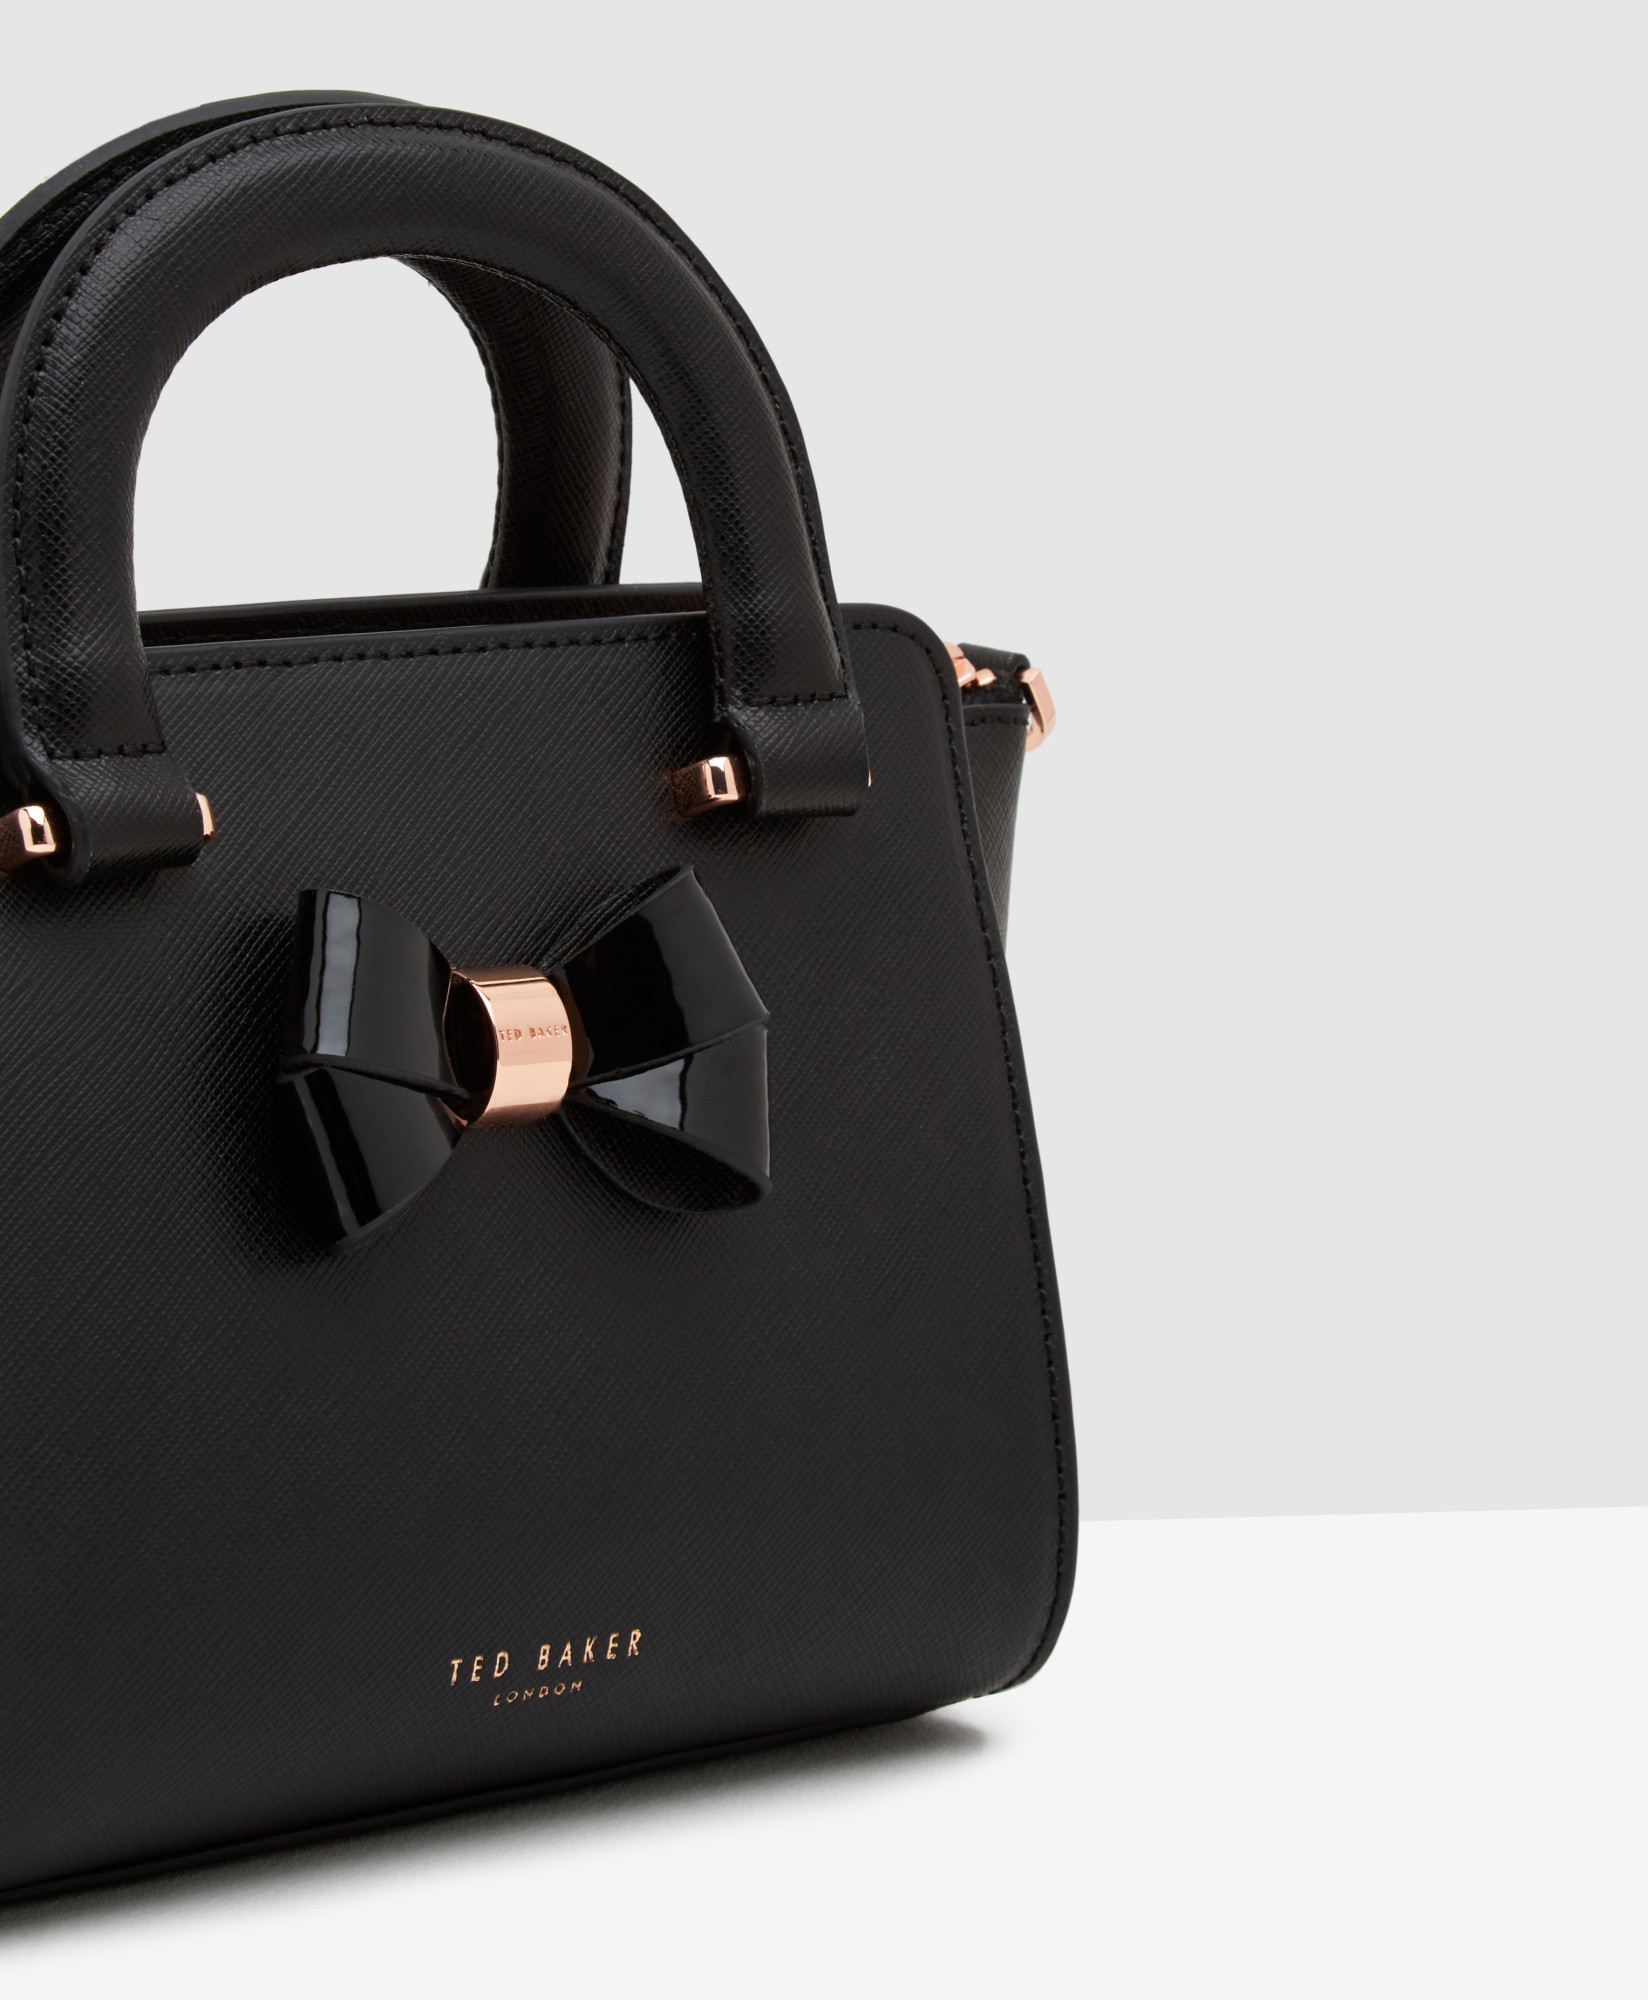 Lyst - Ted Baker Mini Bow Crosshatch Leather Shopper Bag in Black dc46e82644